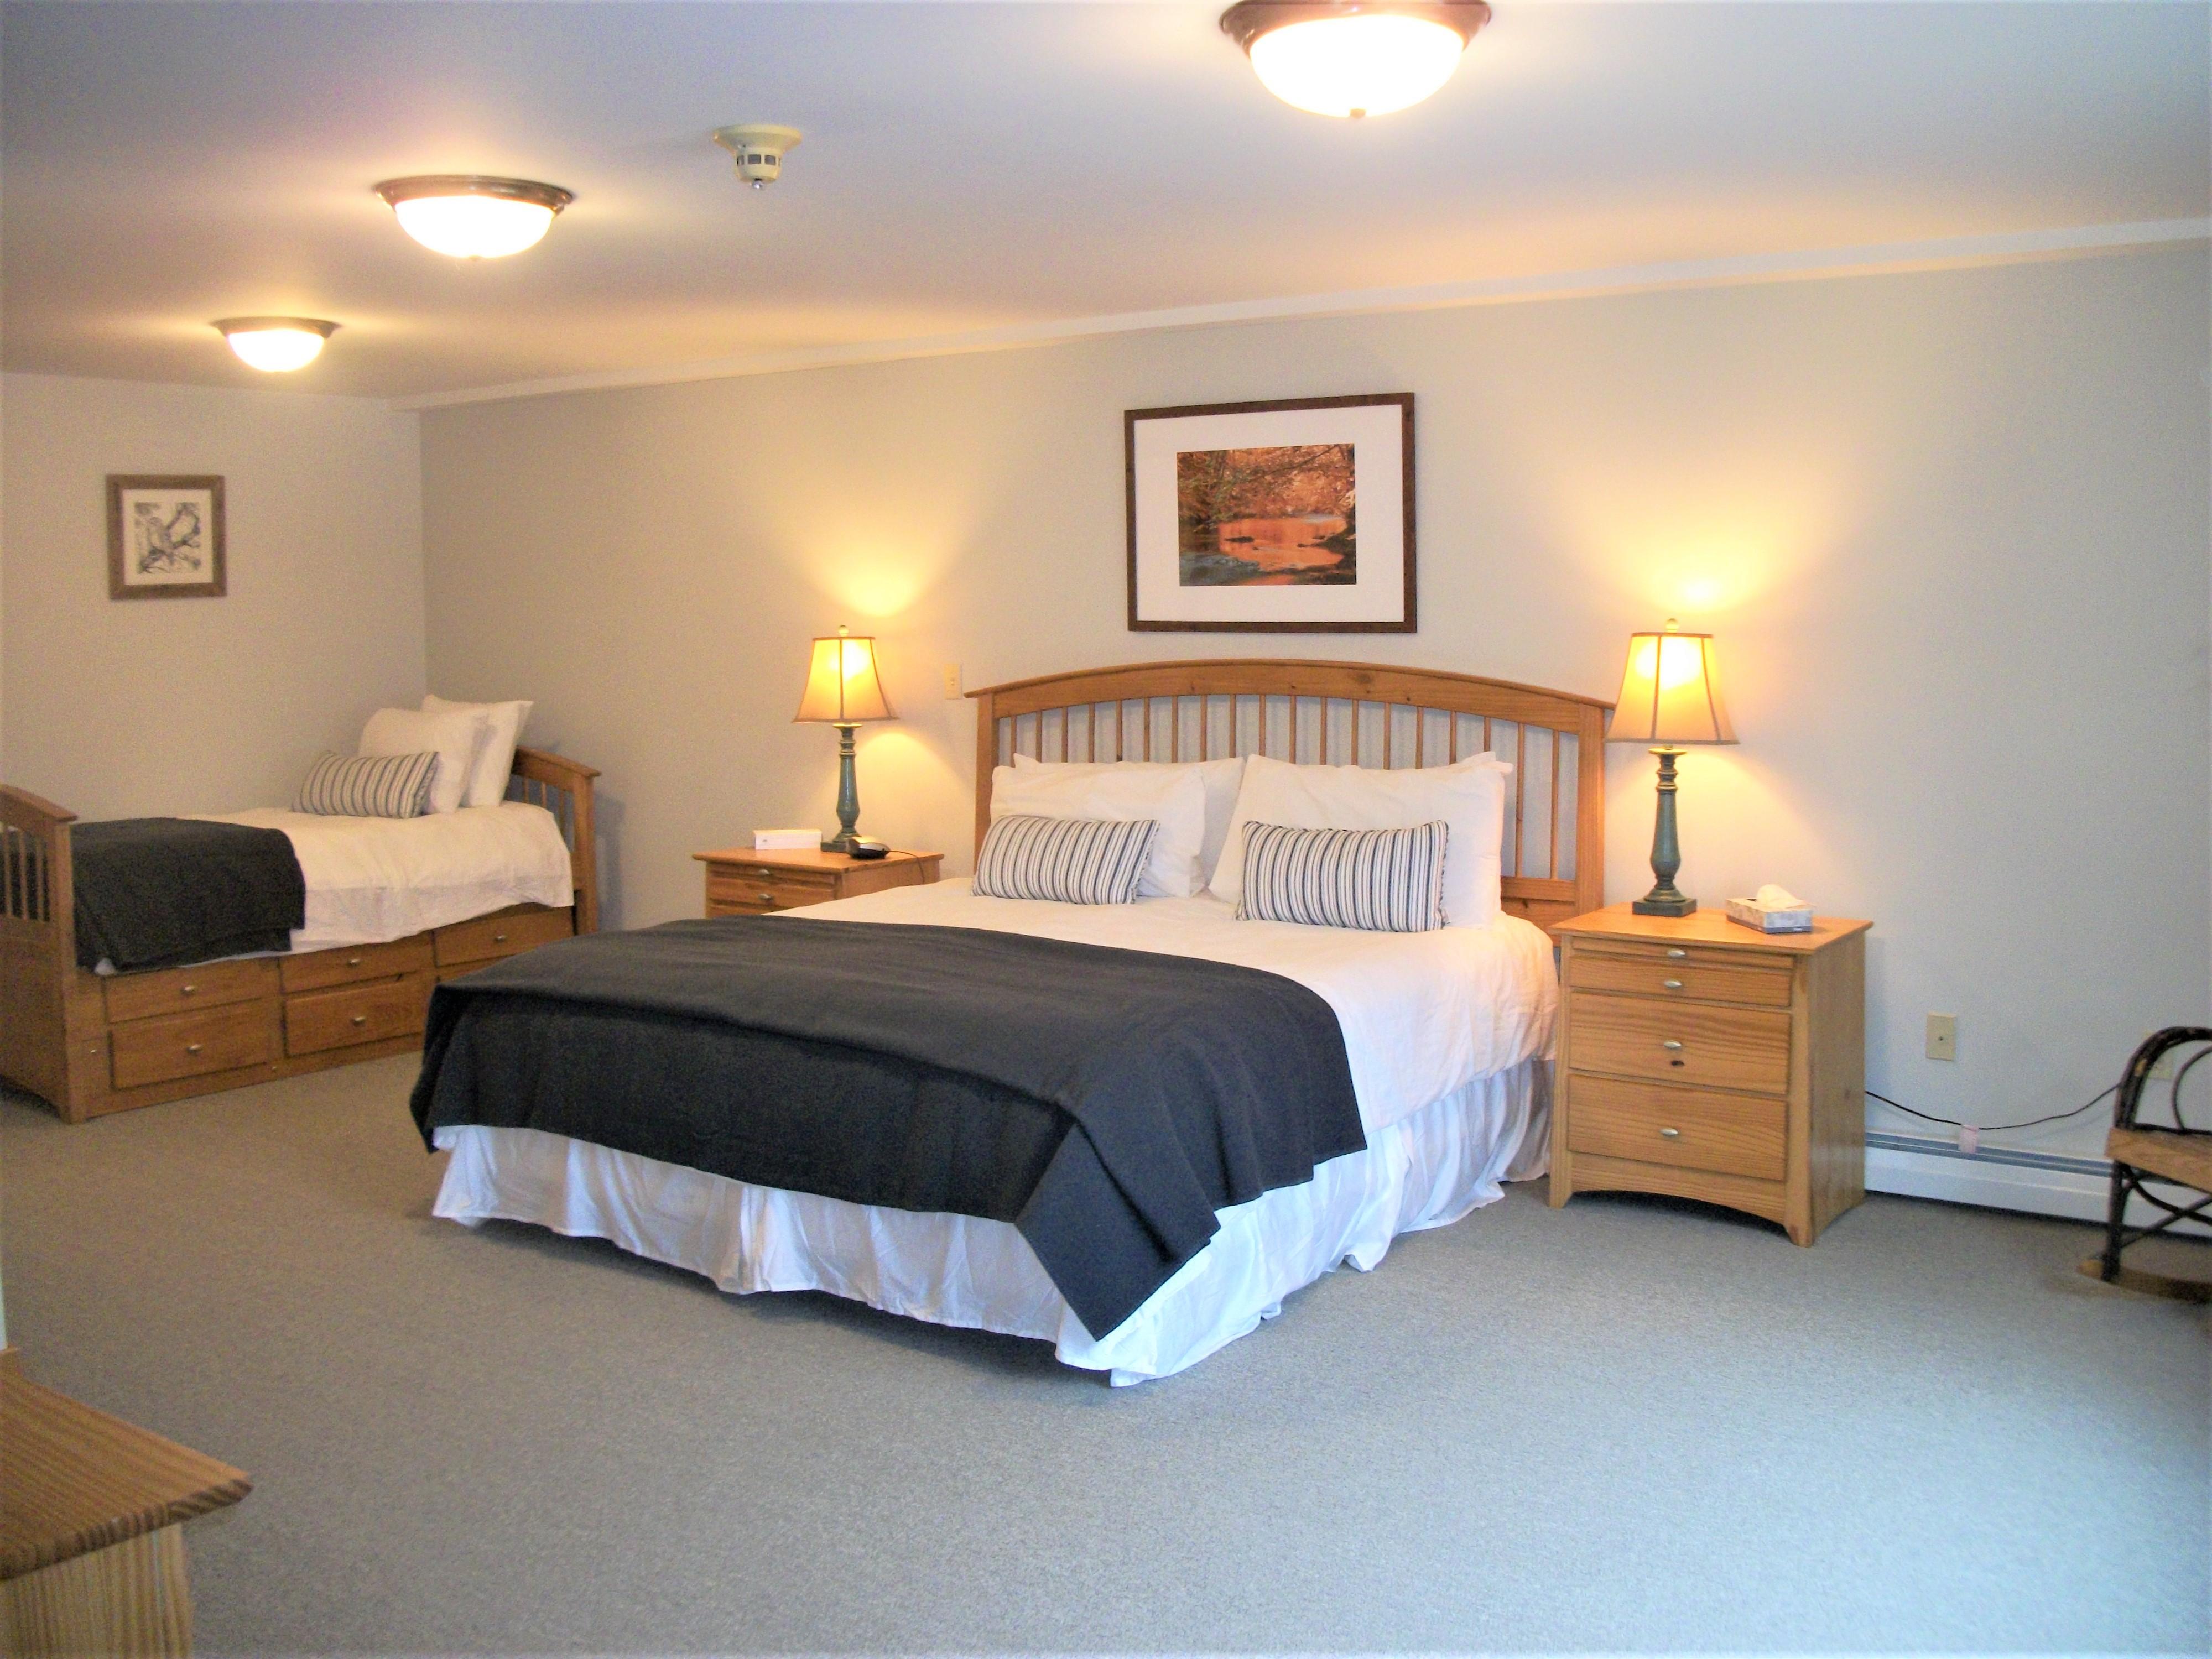 Birches Room 25 Garnet Hill Lodge